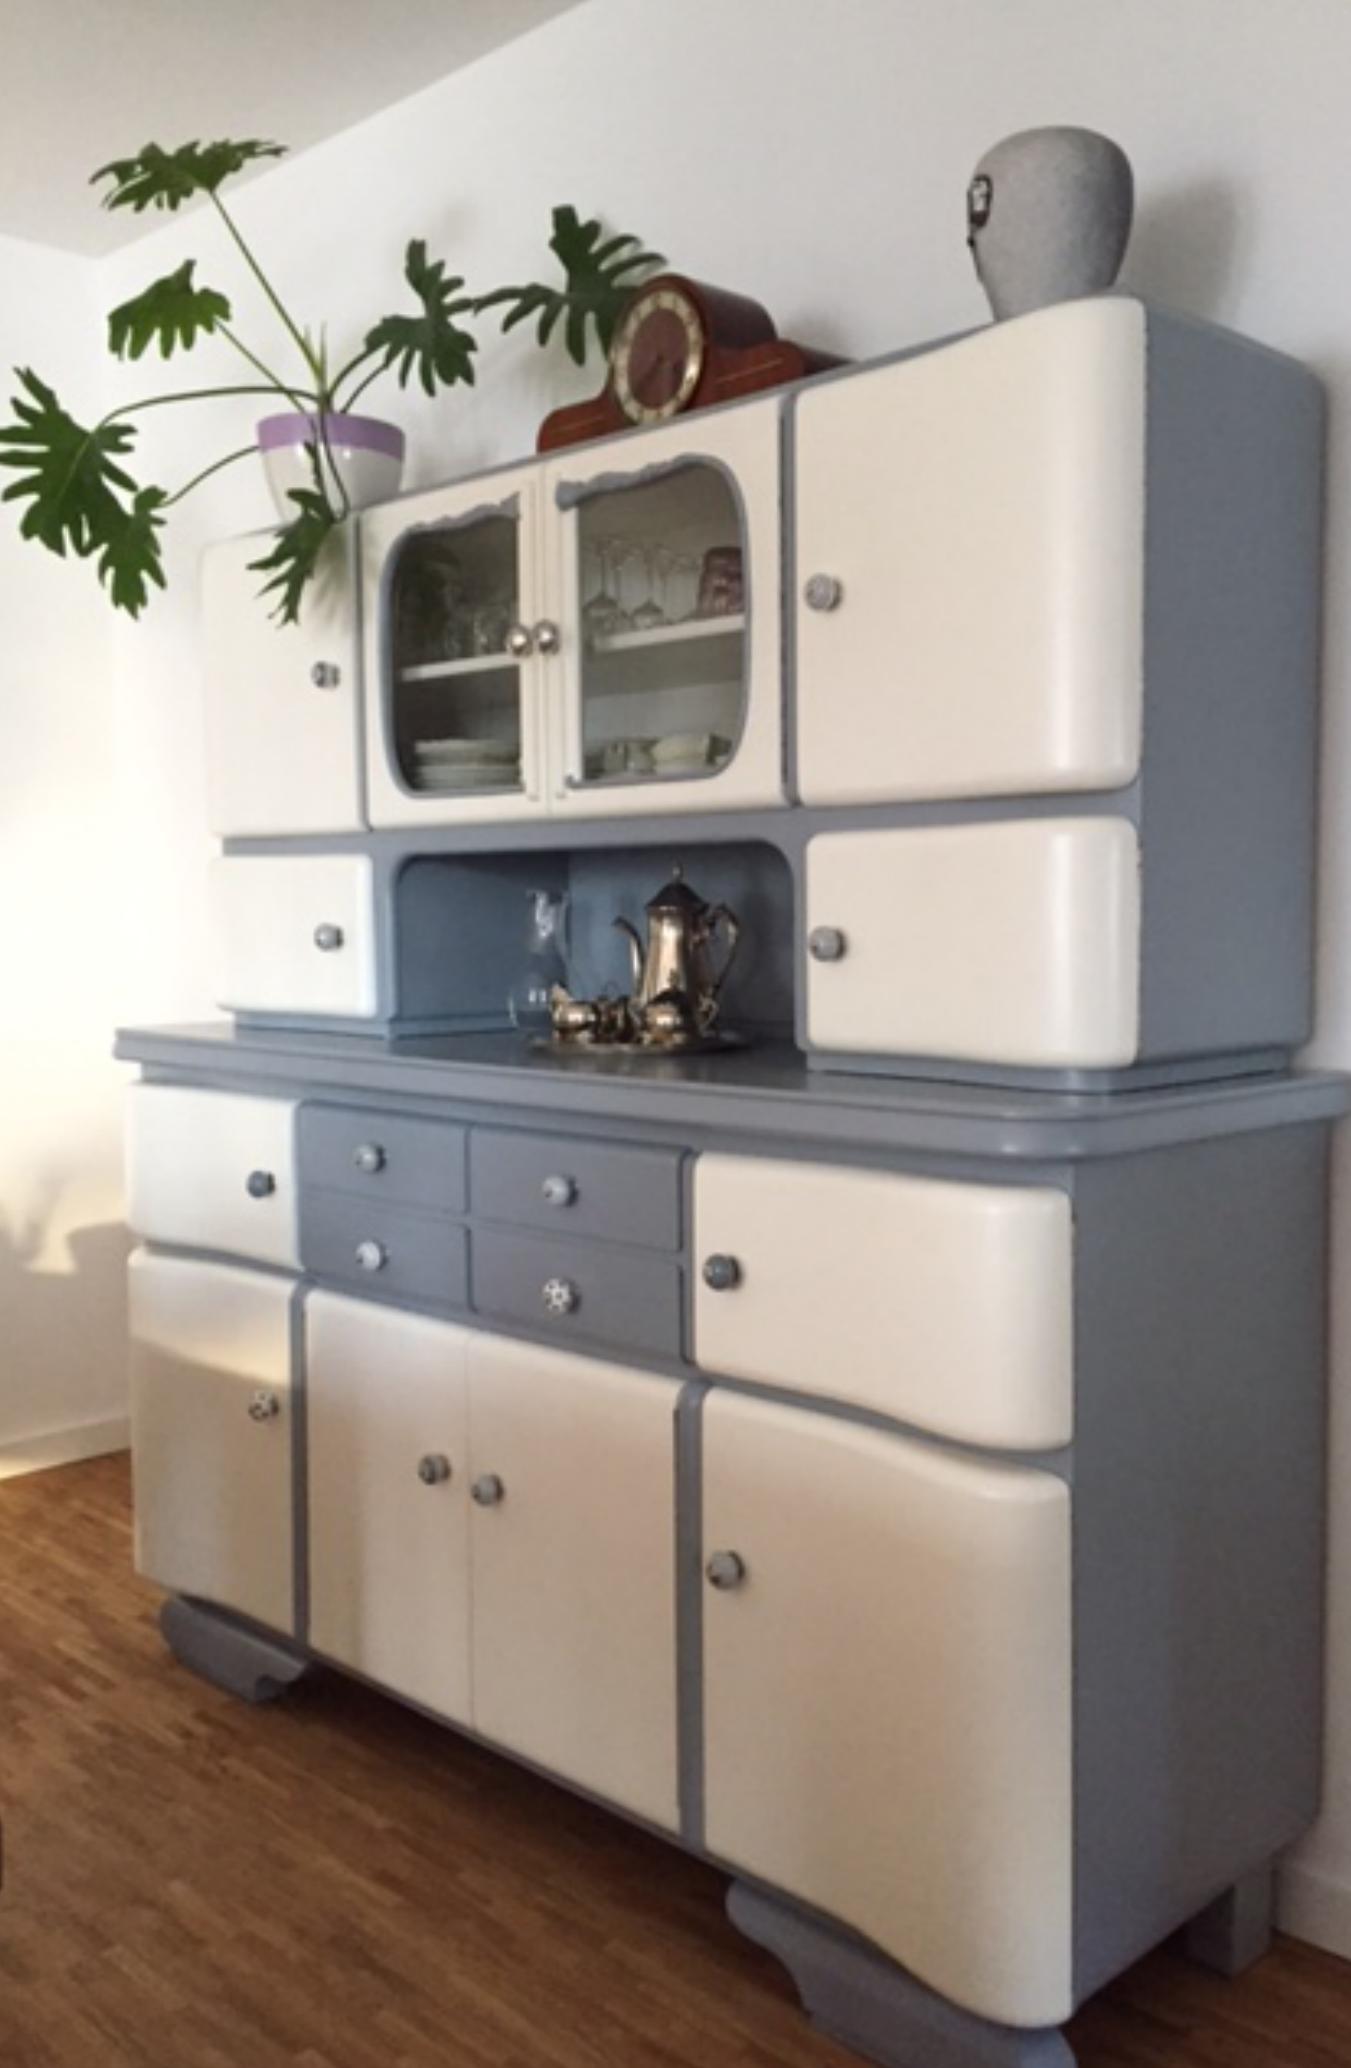 k chenbuffet homeshoot garagenmoebel k chenbuffet alte k chenschr nkegaragenmoebel. Black Bedroom Furniture Sets. Home Design Ideas